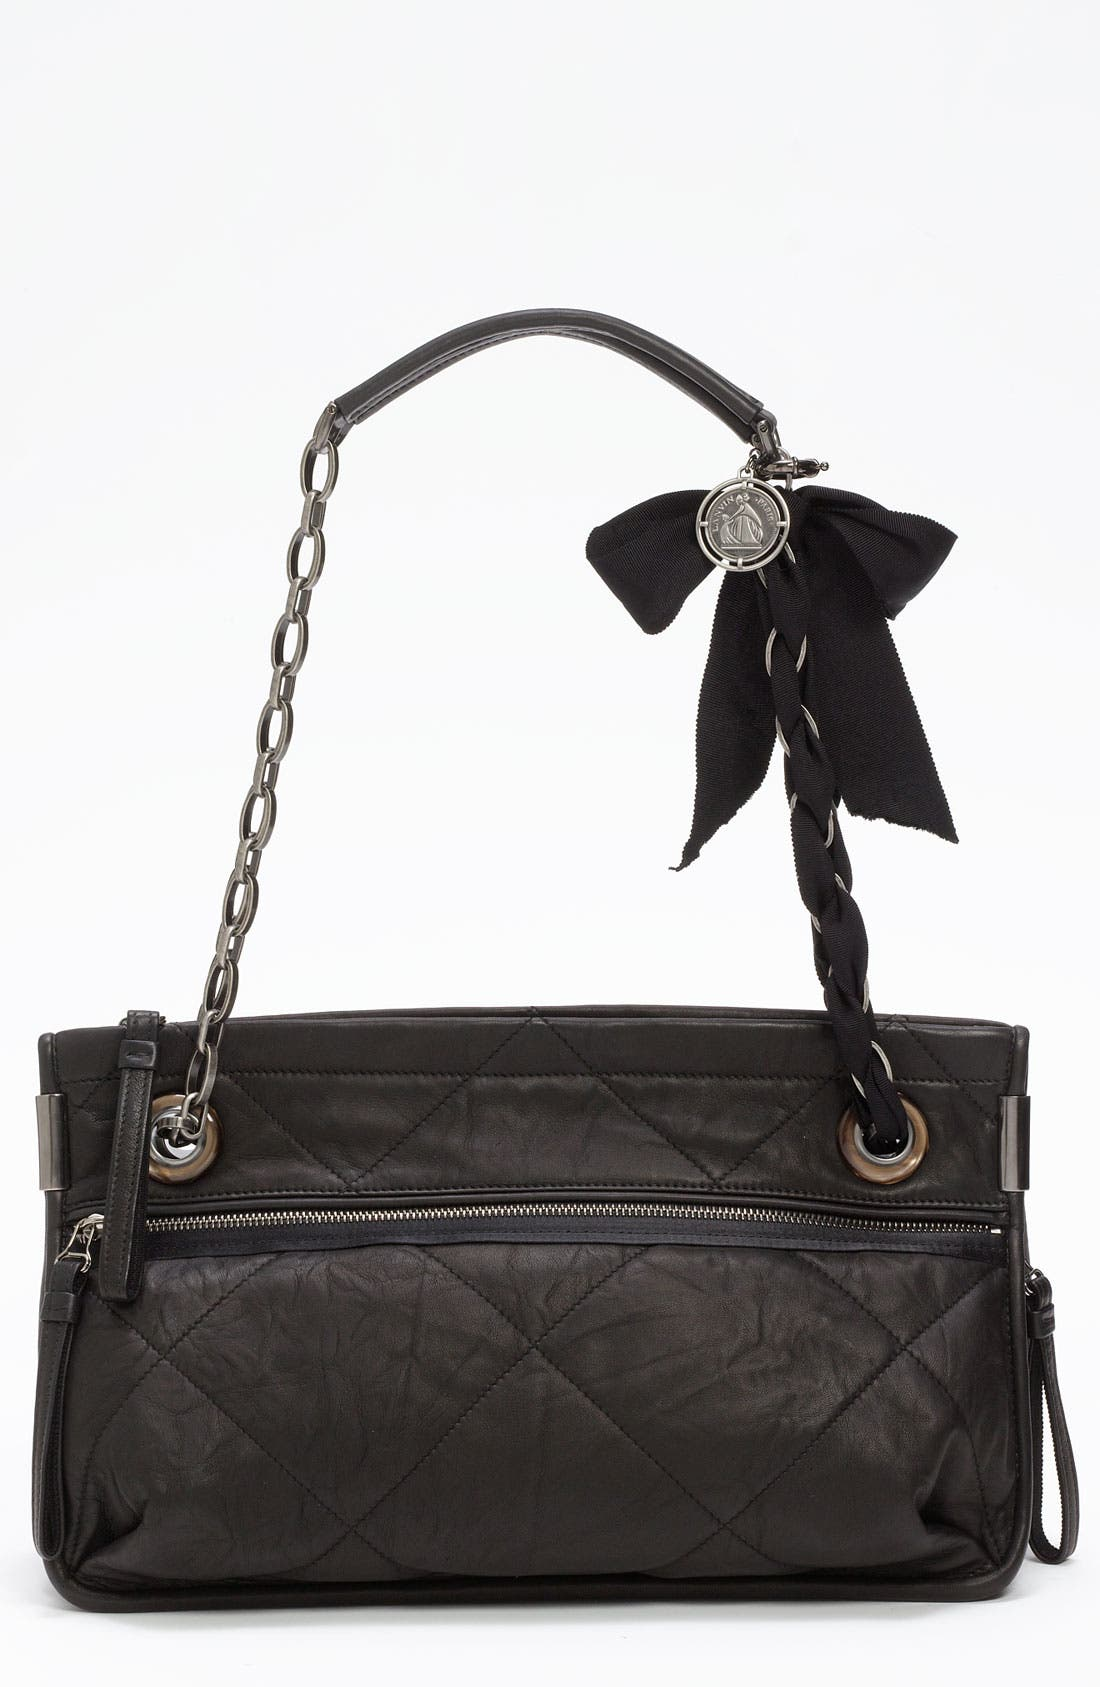 Alternate Image 1 Selected - Lanvin 'Amalia - Medium' Leather Shoulder Bag